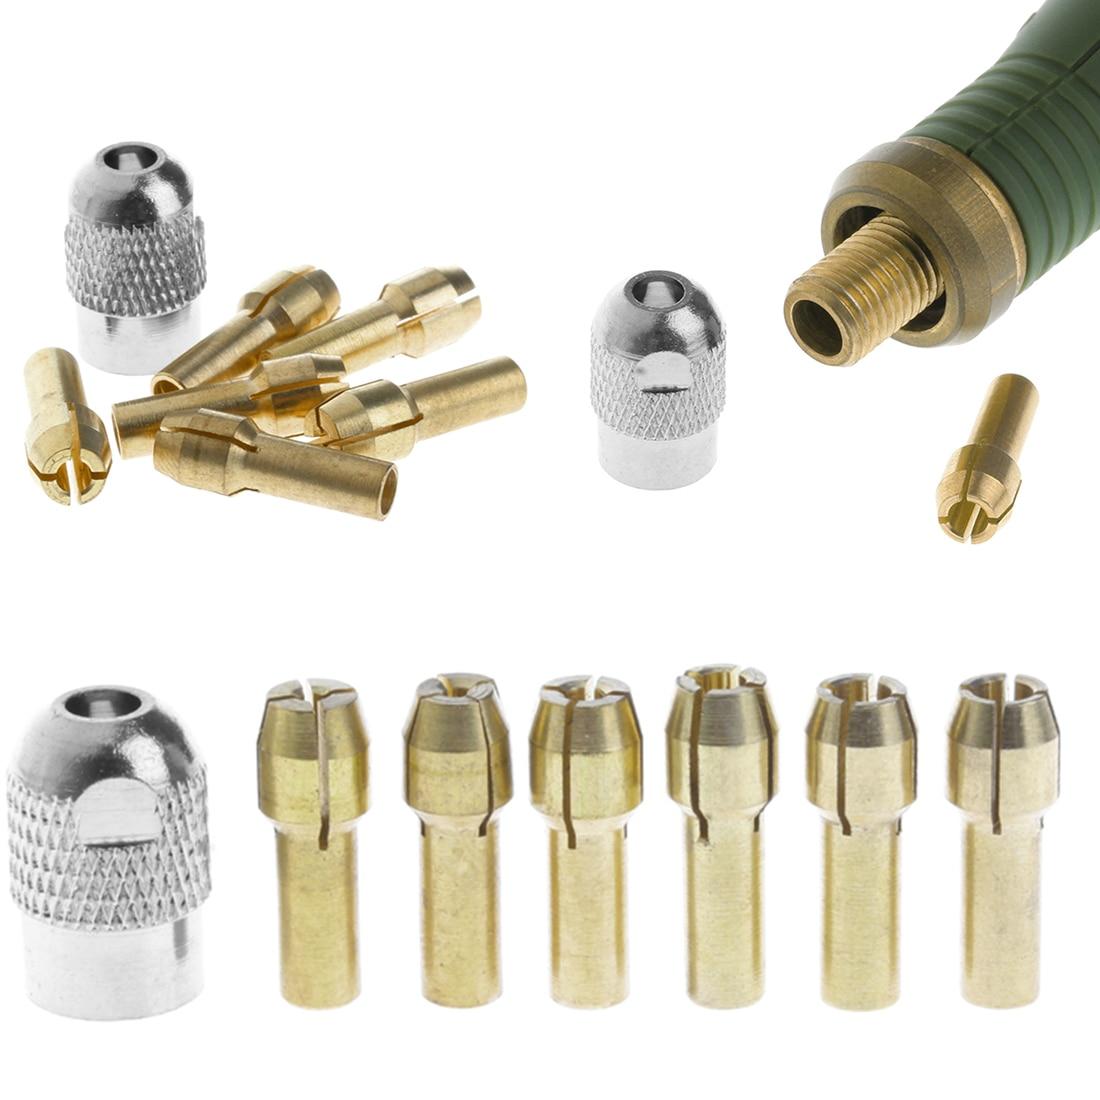 "Shaft Screw Cap Set For Grinder Rotary Grinder 0.17/"" Drill Brass Collets Shank"